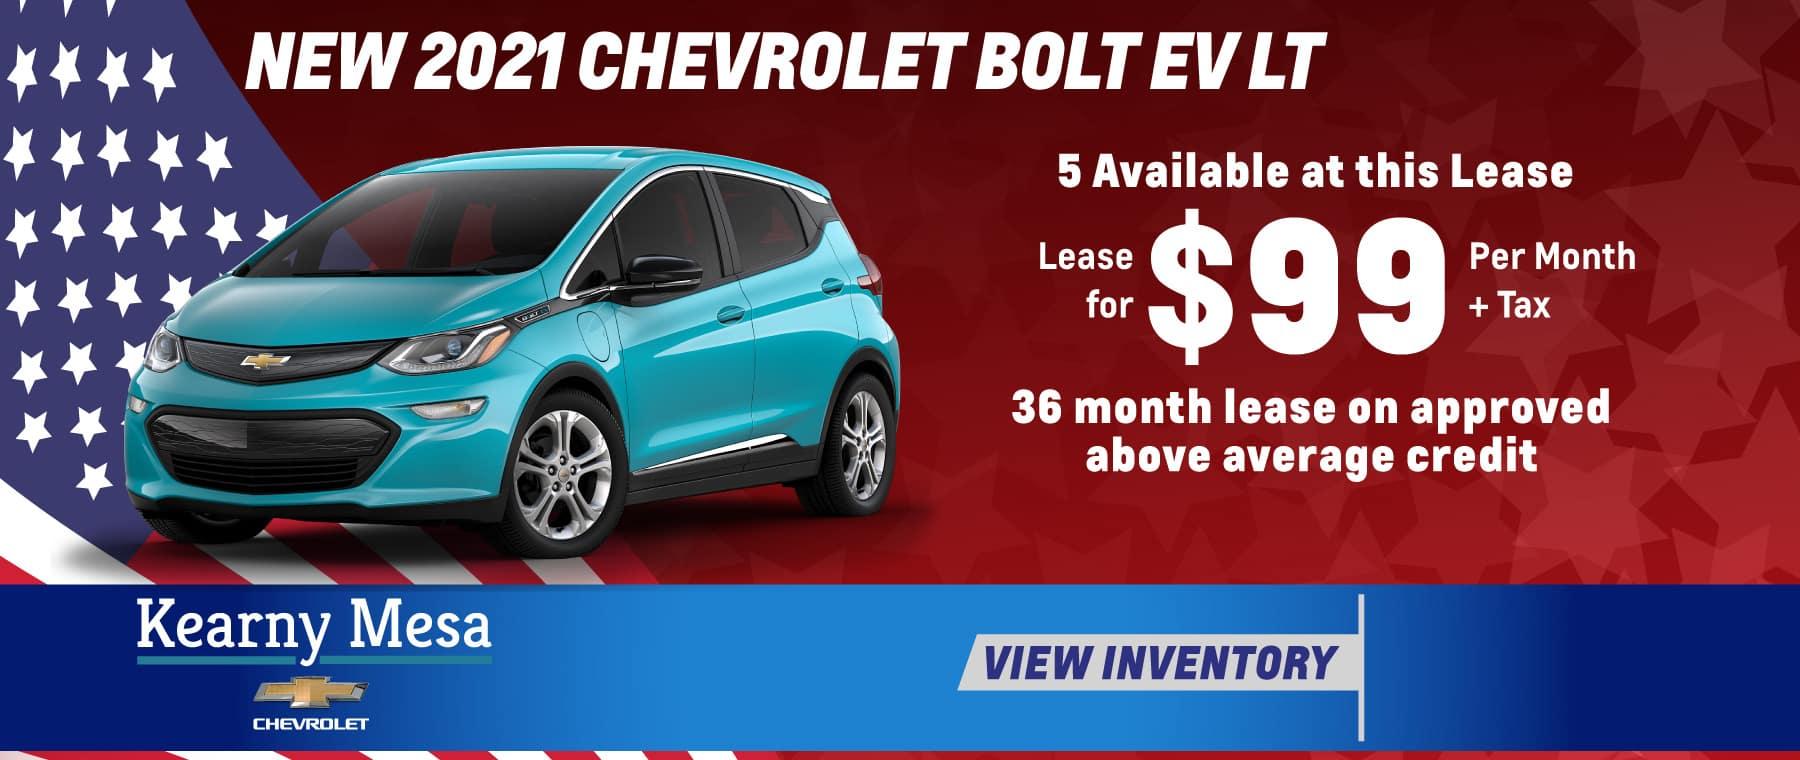 KMC 1800px May31_Bolt EV LT